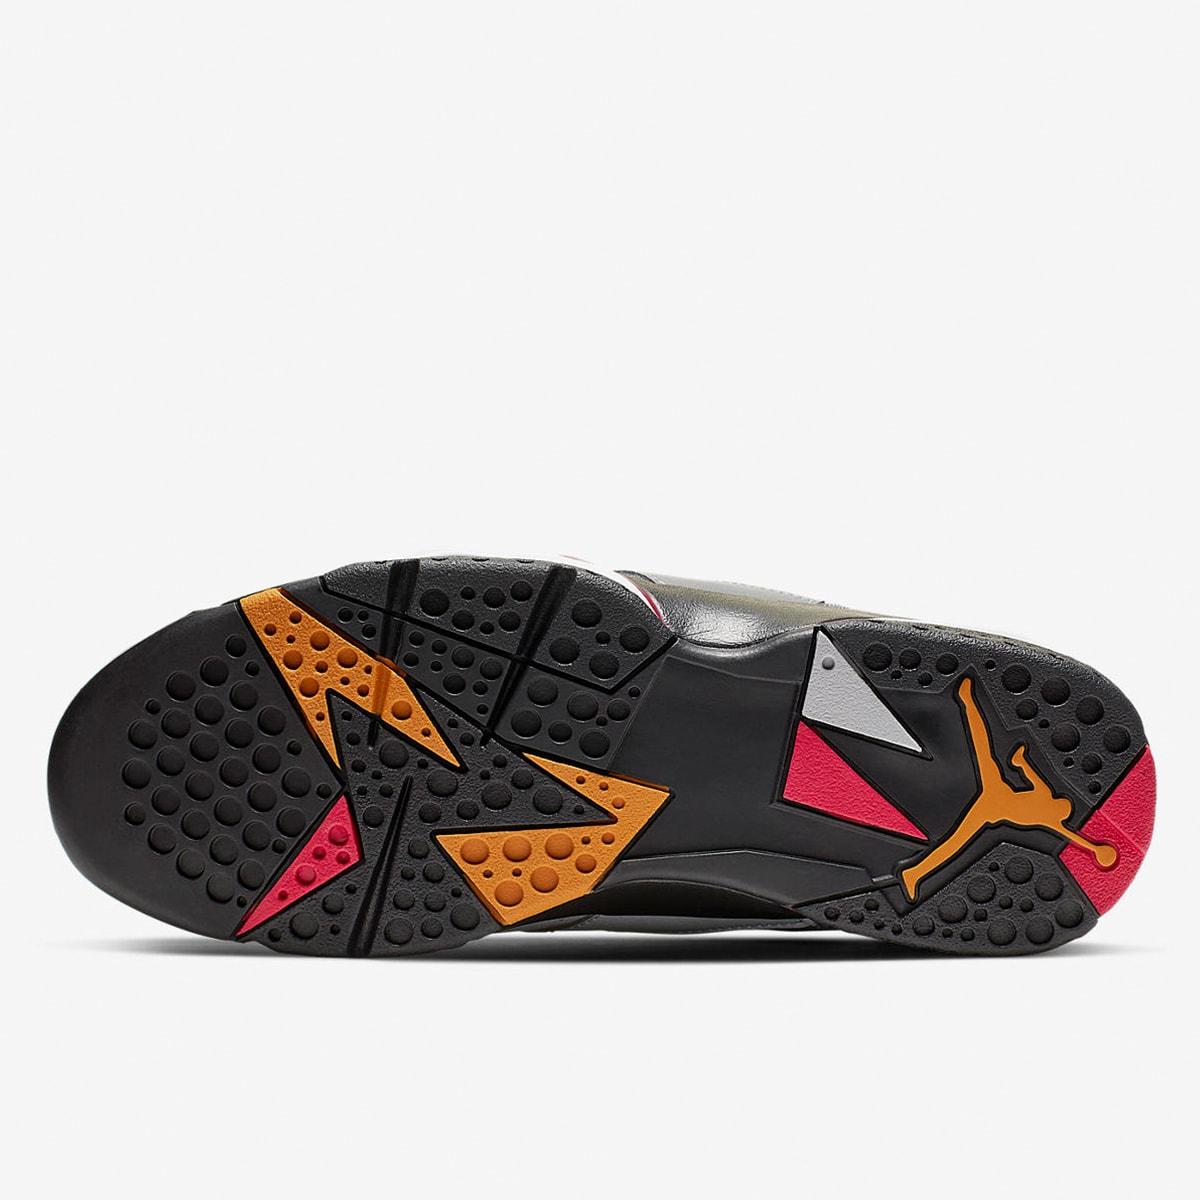 Nike Air Jordan 7 Retro SP - BV6281-006